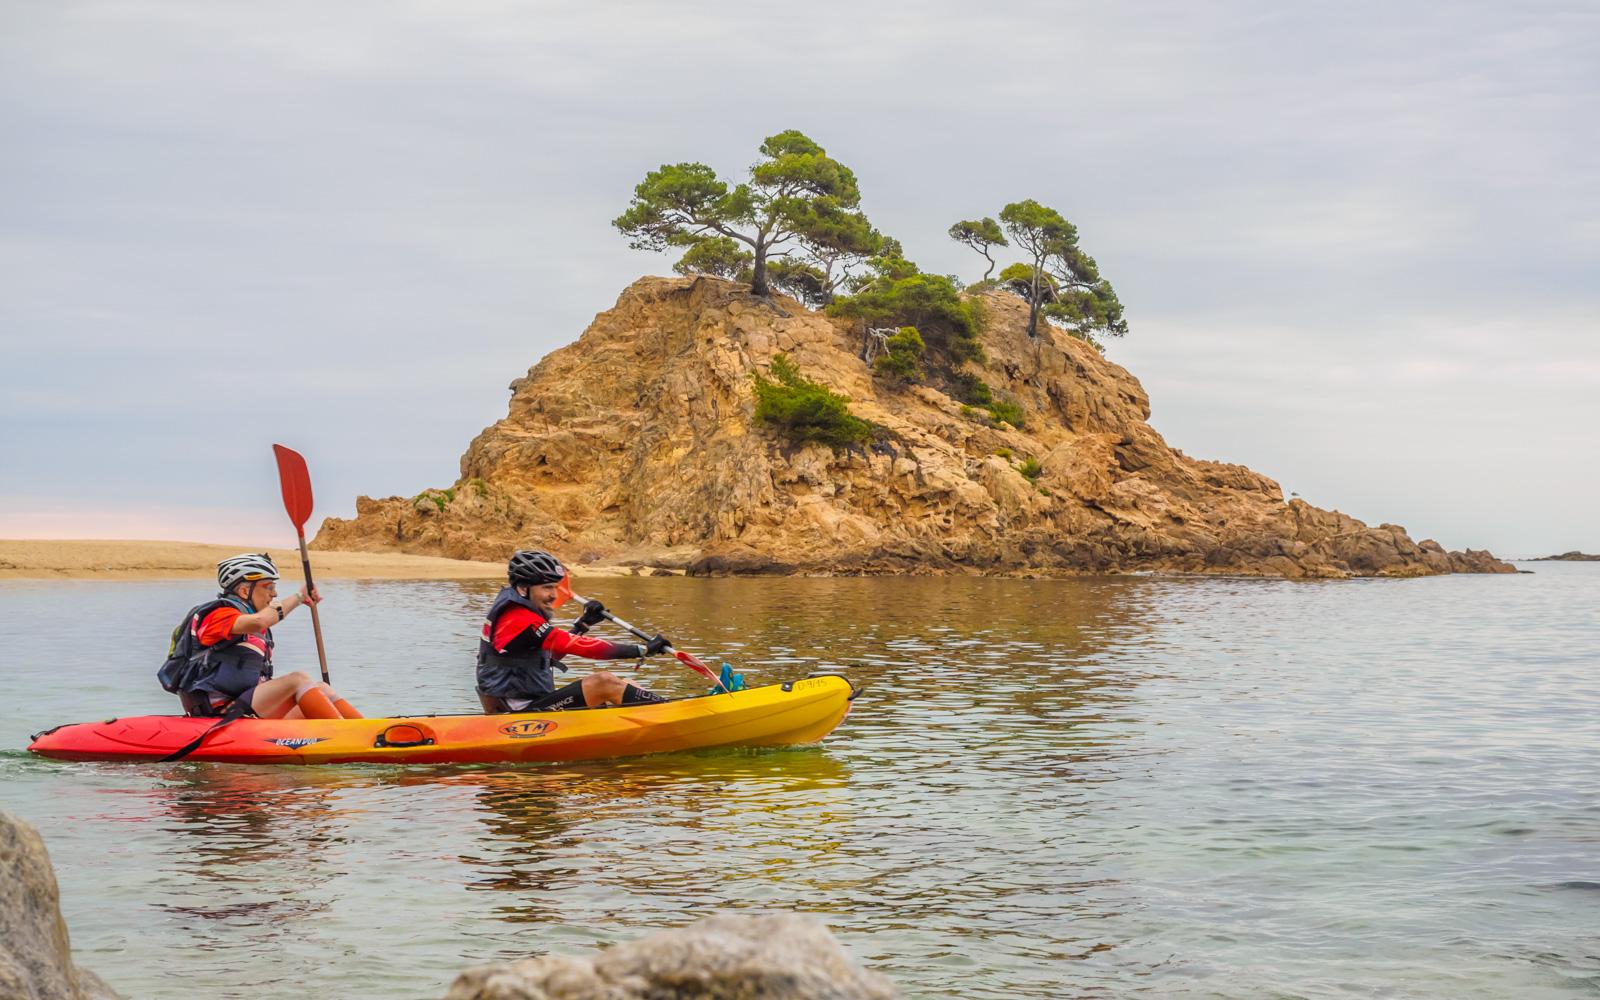 Indiketes Adventure Race 2016 (Platja d'Aro-Costa Brava)